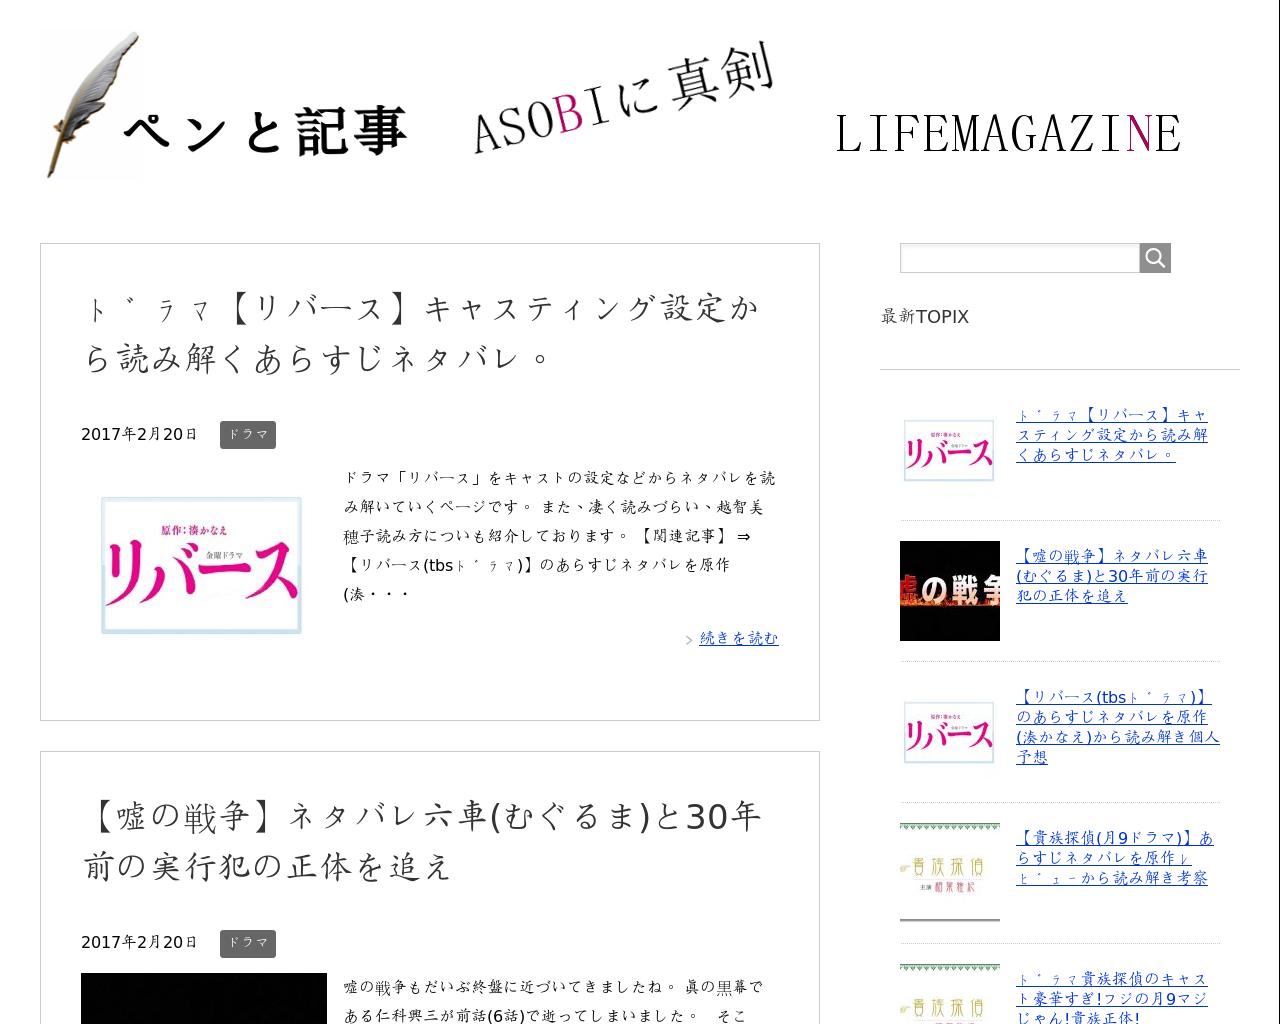 entertainmentstation.jp(2017/12/04 01:00:13)